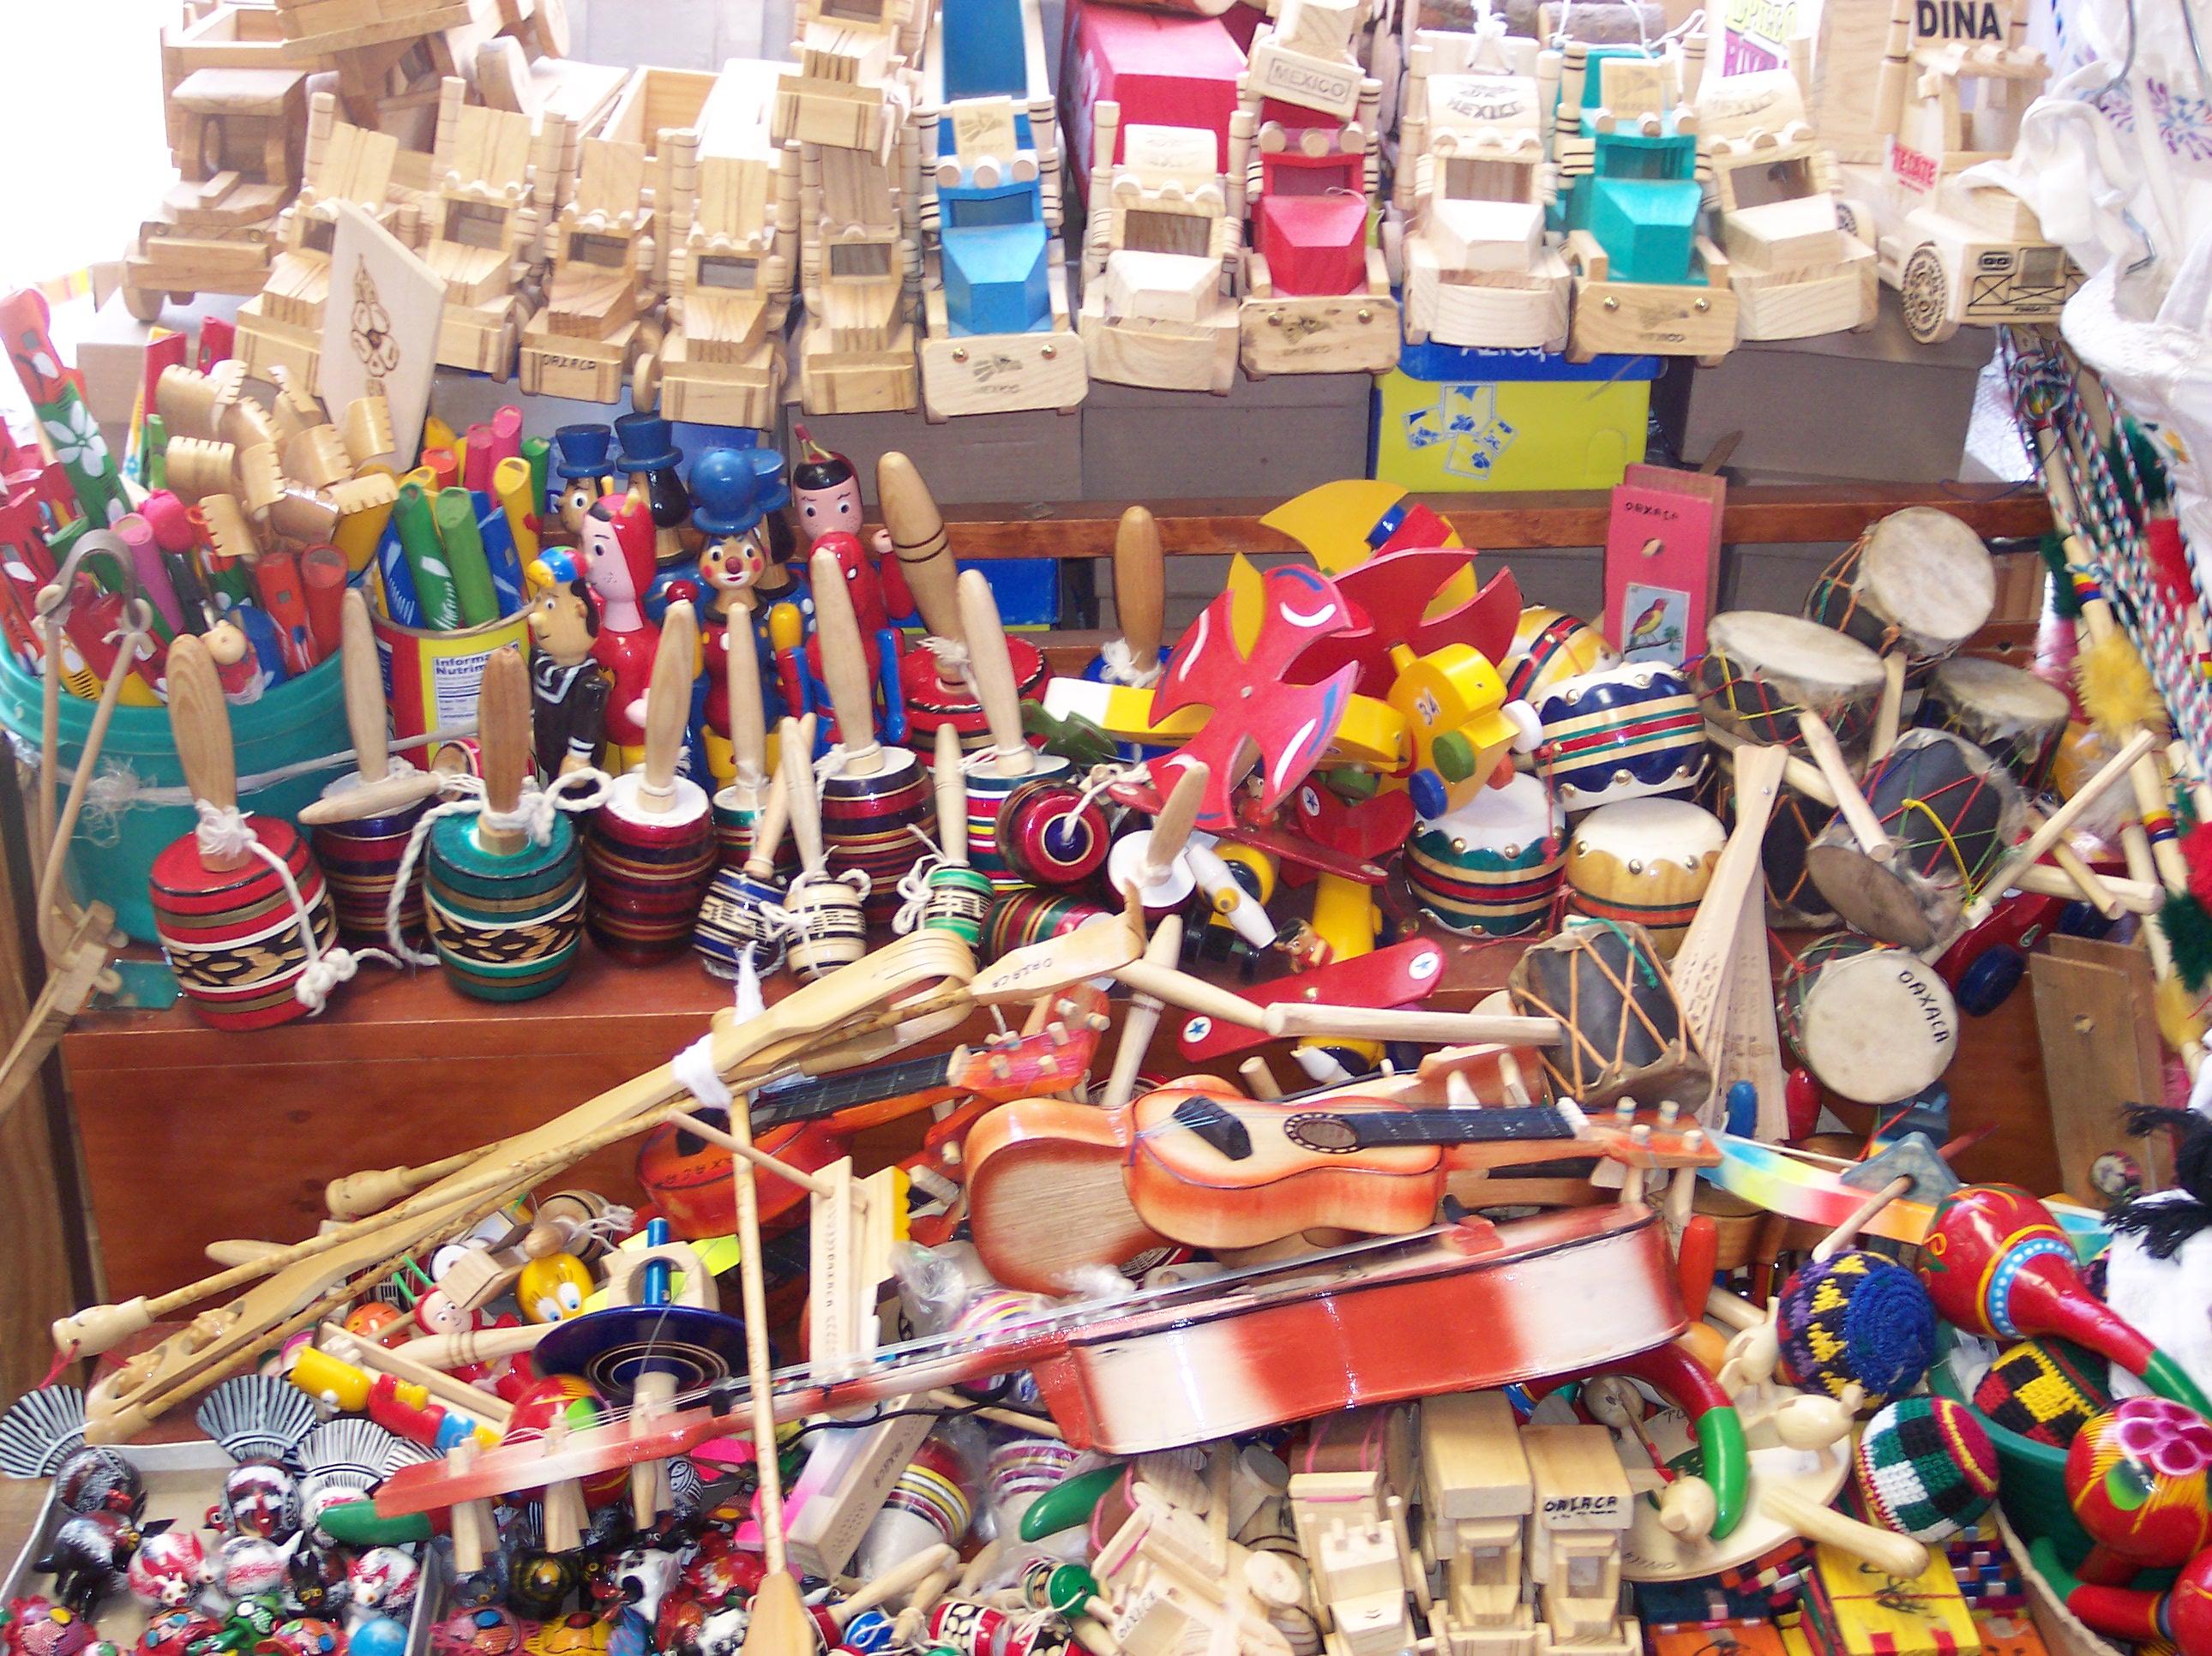 jugueteria en venezuela: